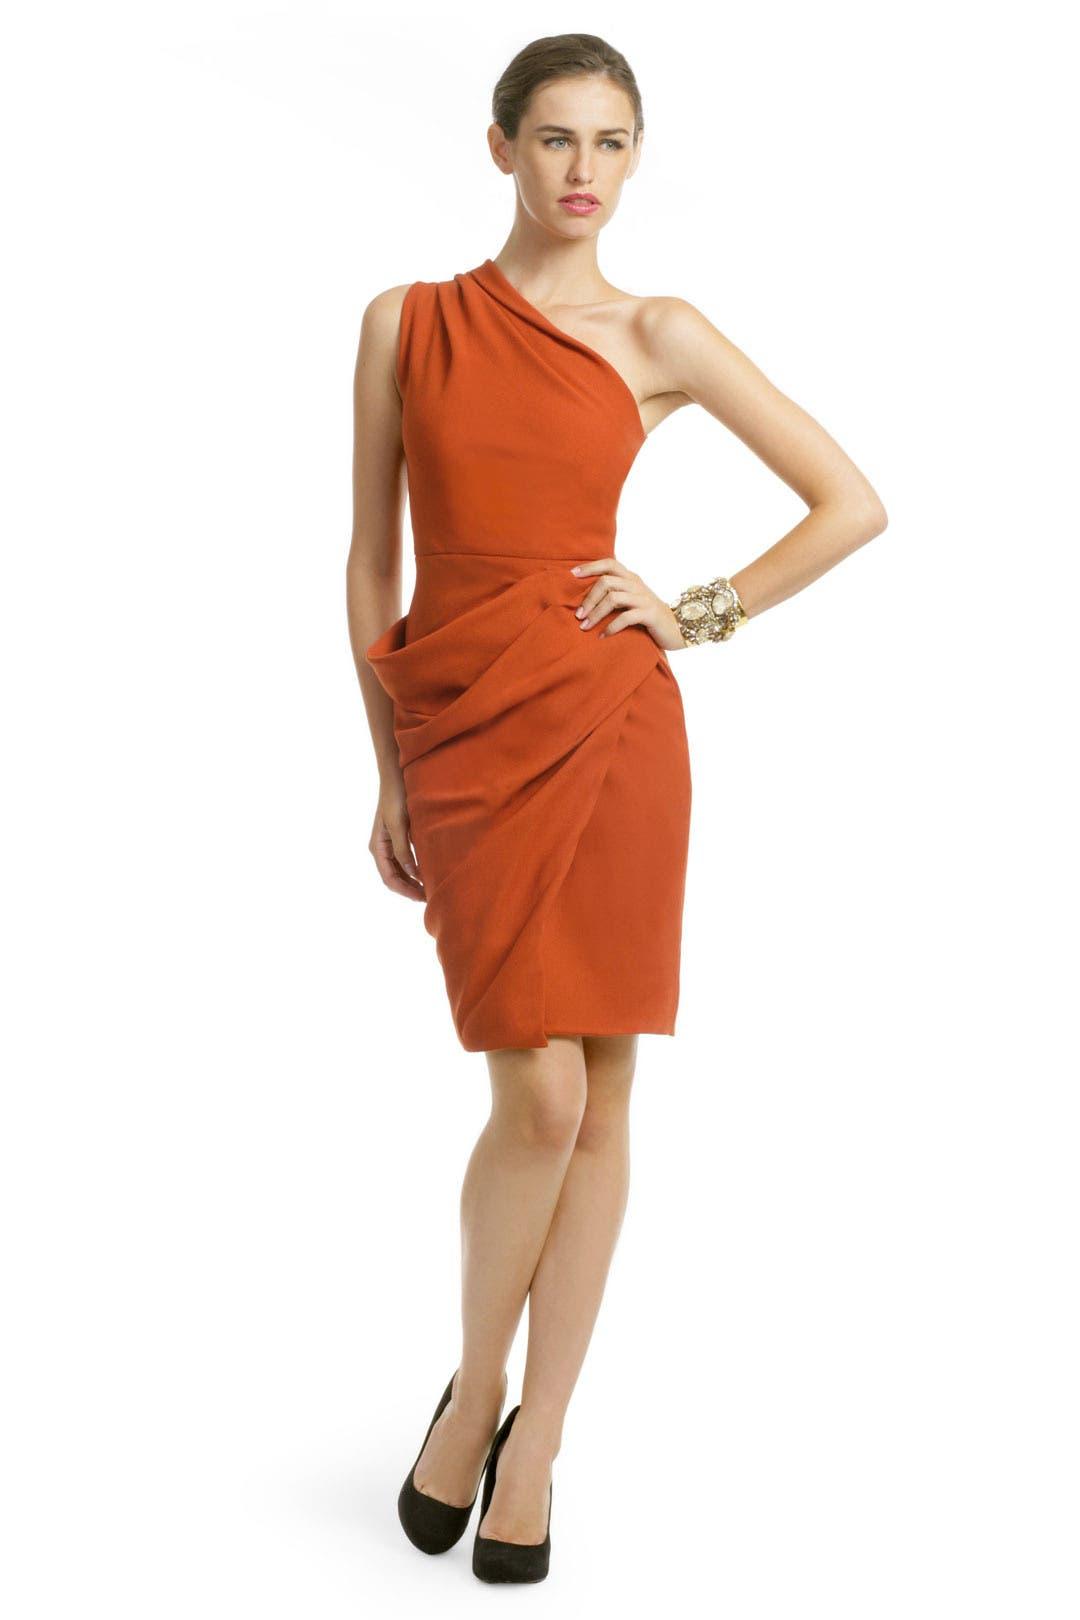 Rusted Orange Dress by Roksanda Ilincic